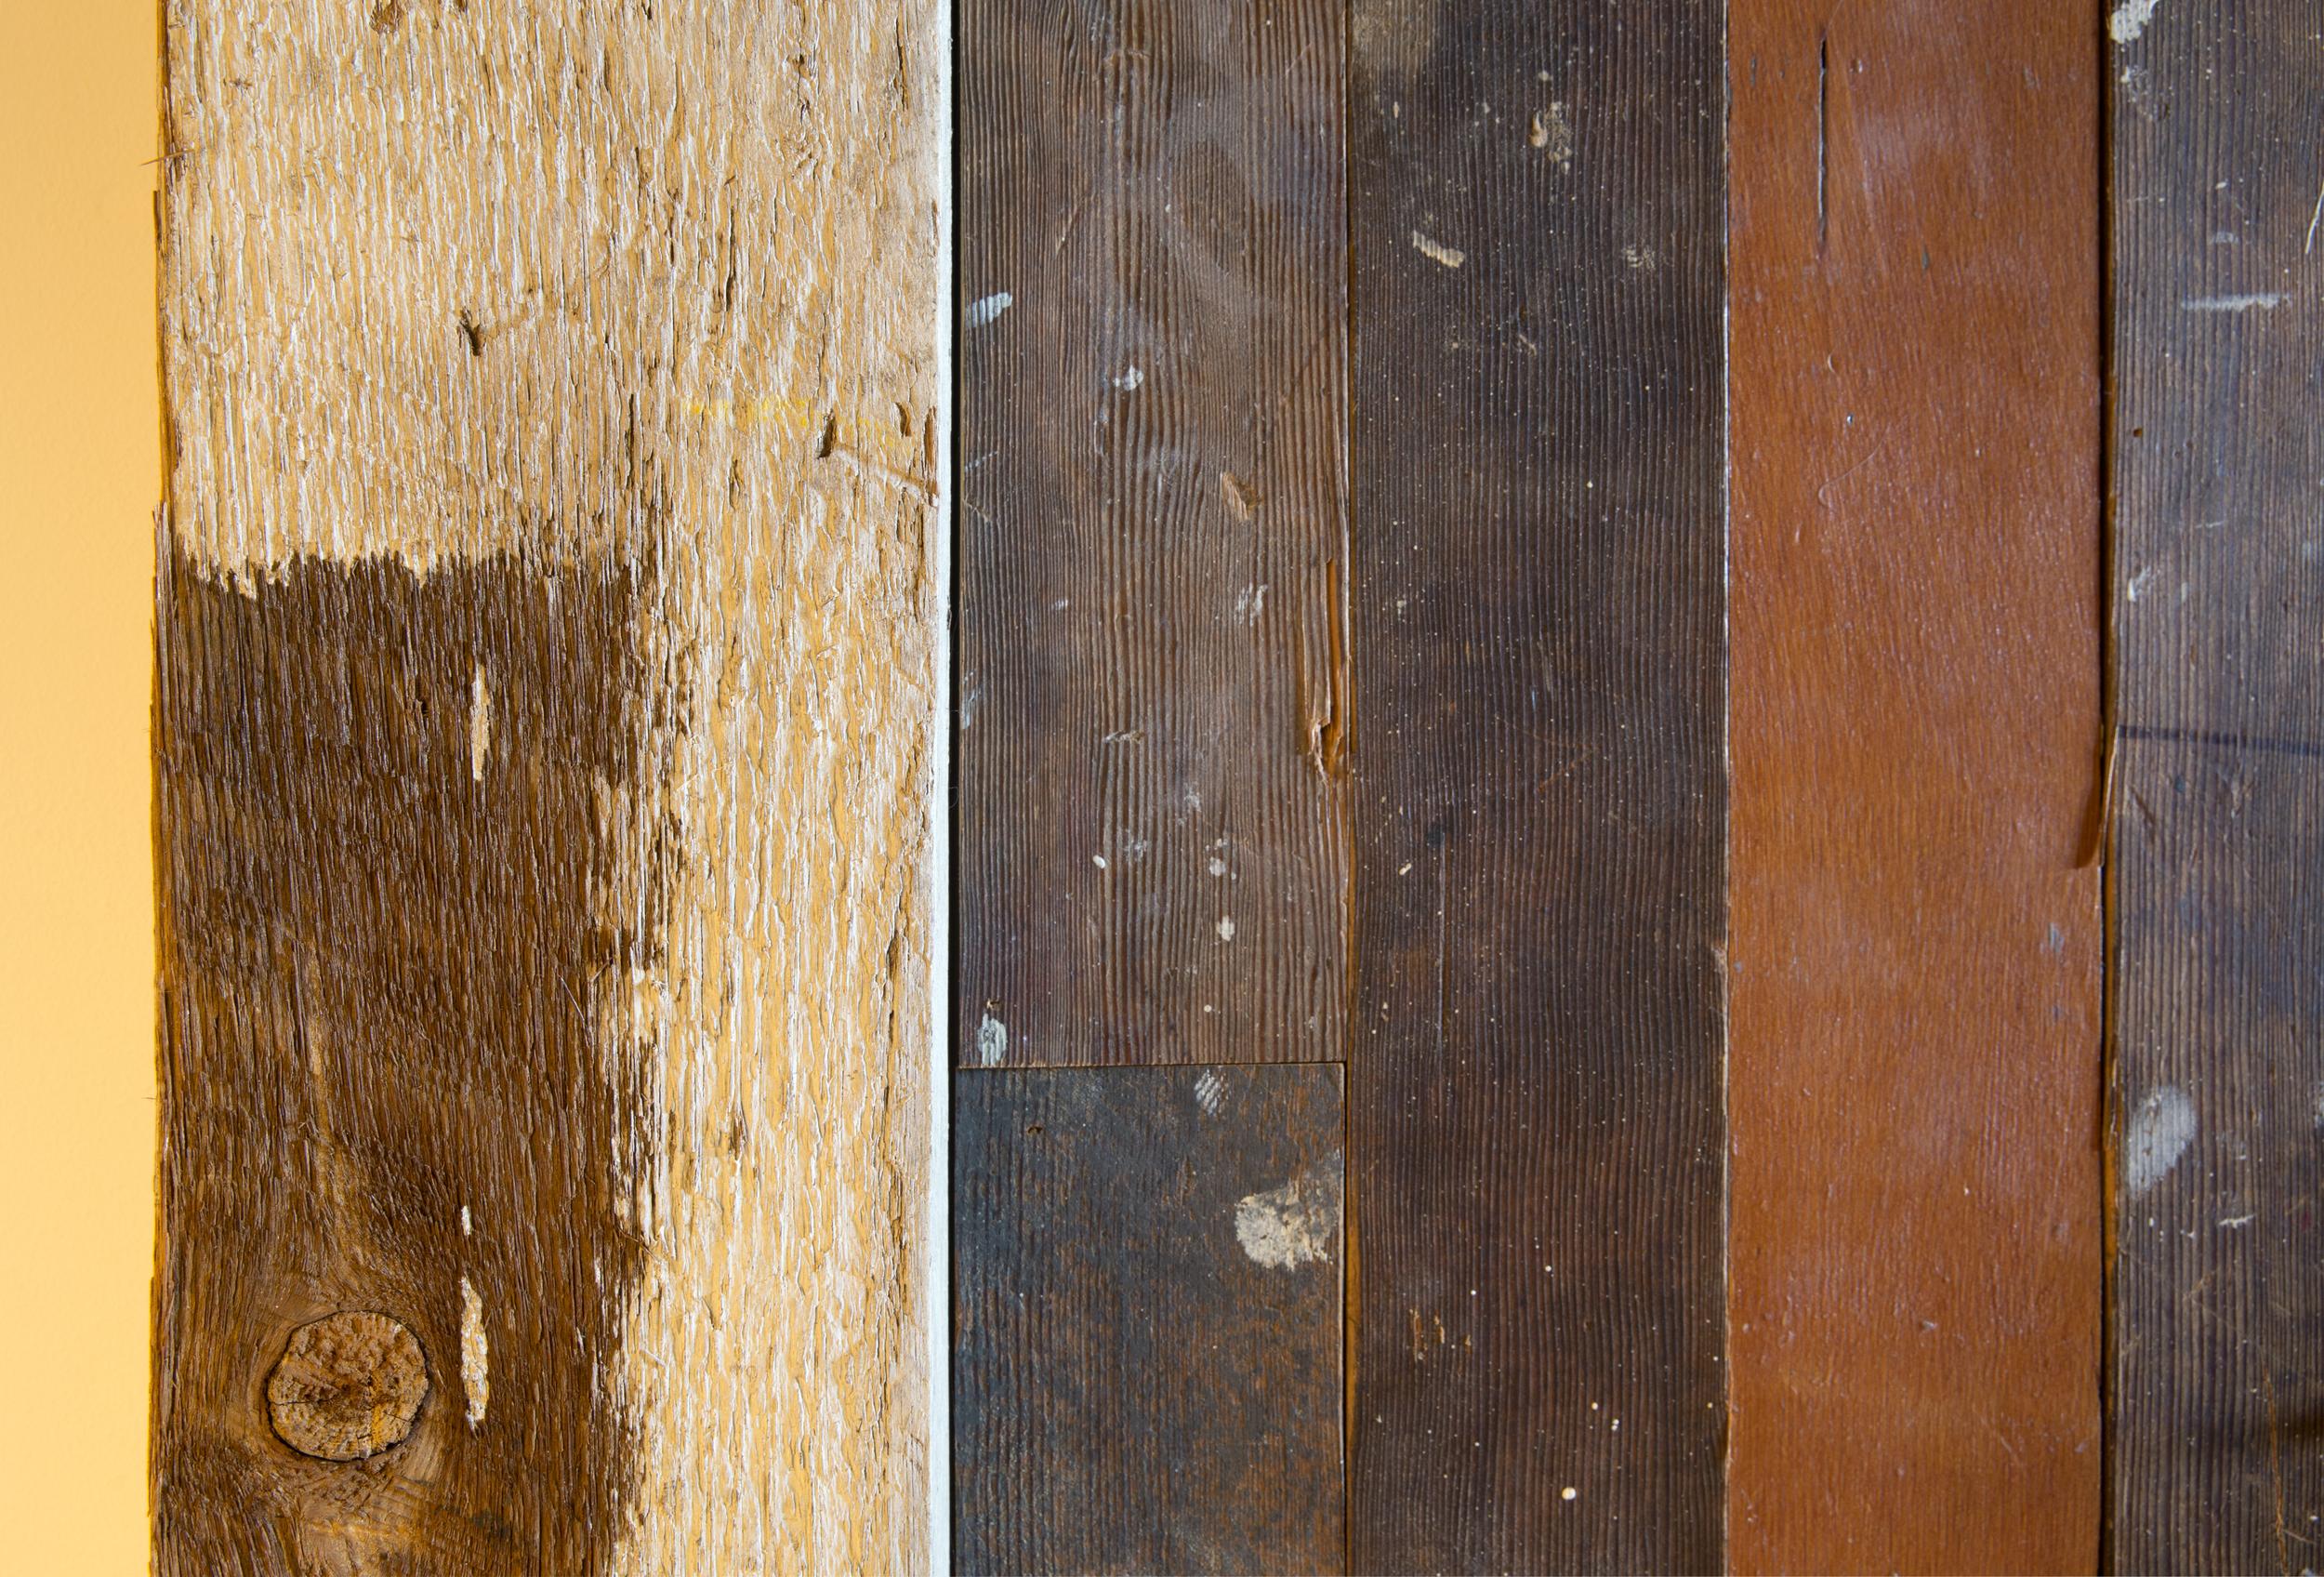 guth-wood-highlight.jpg